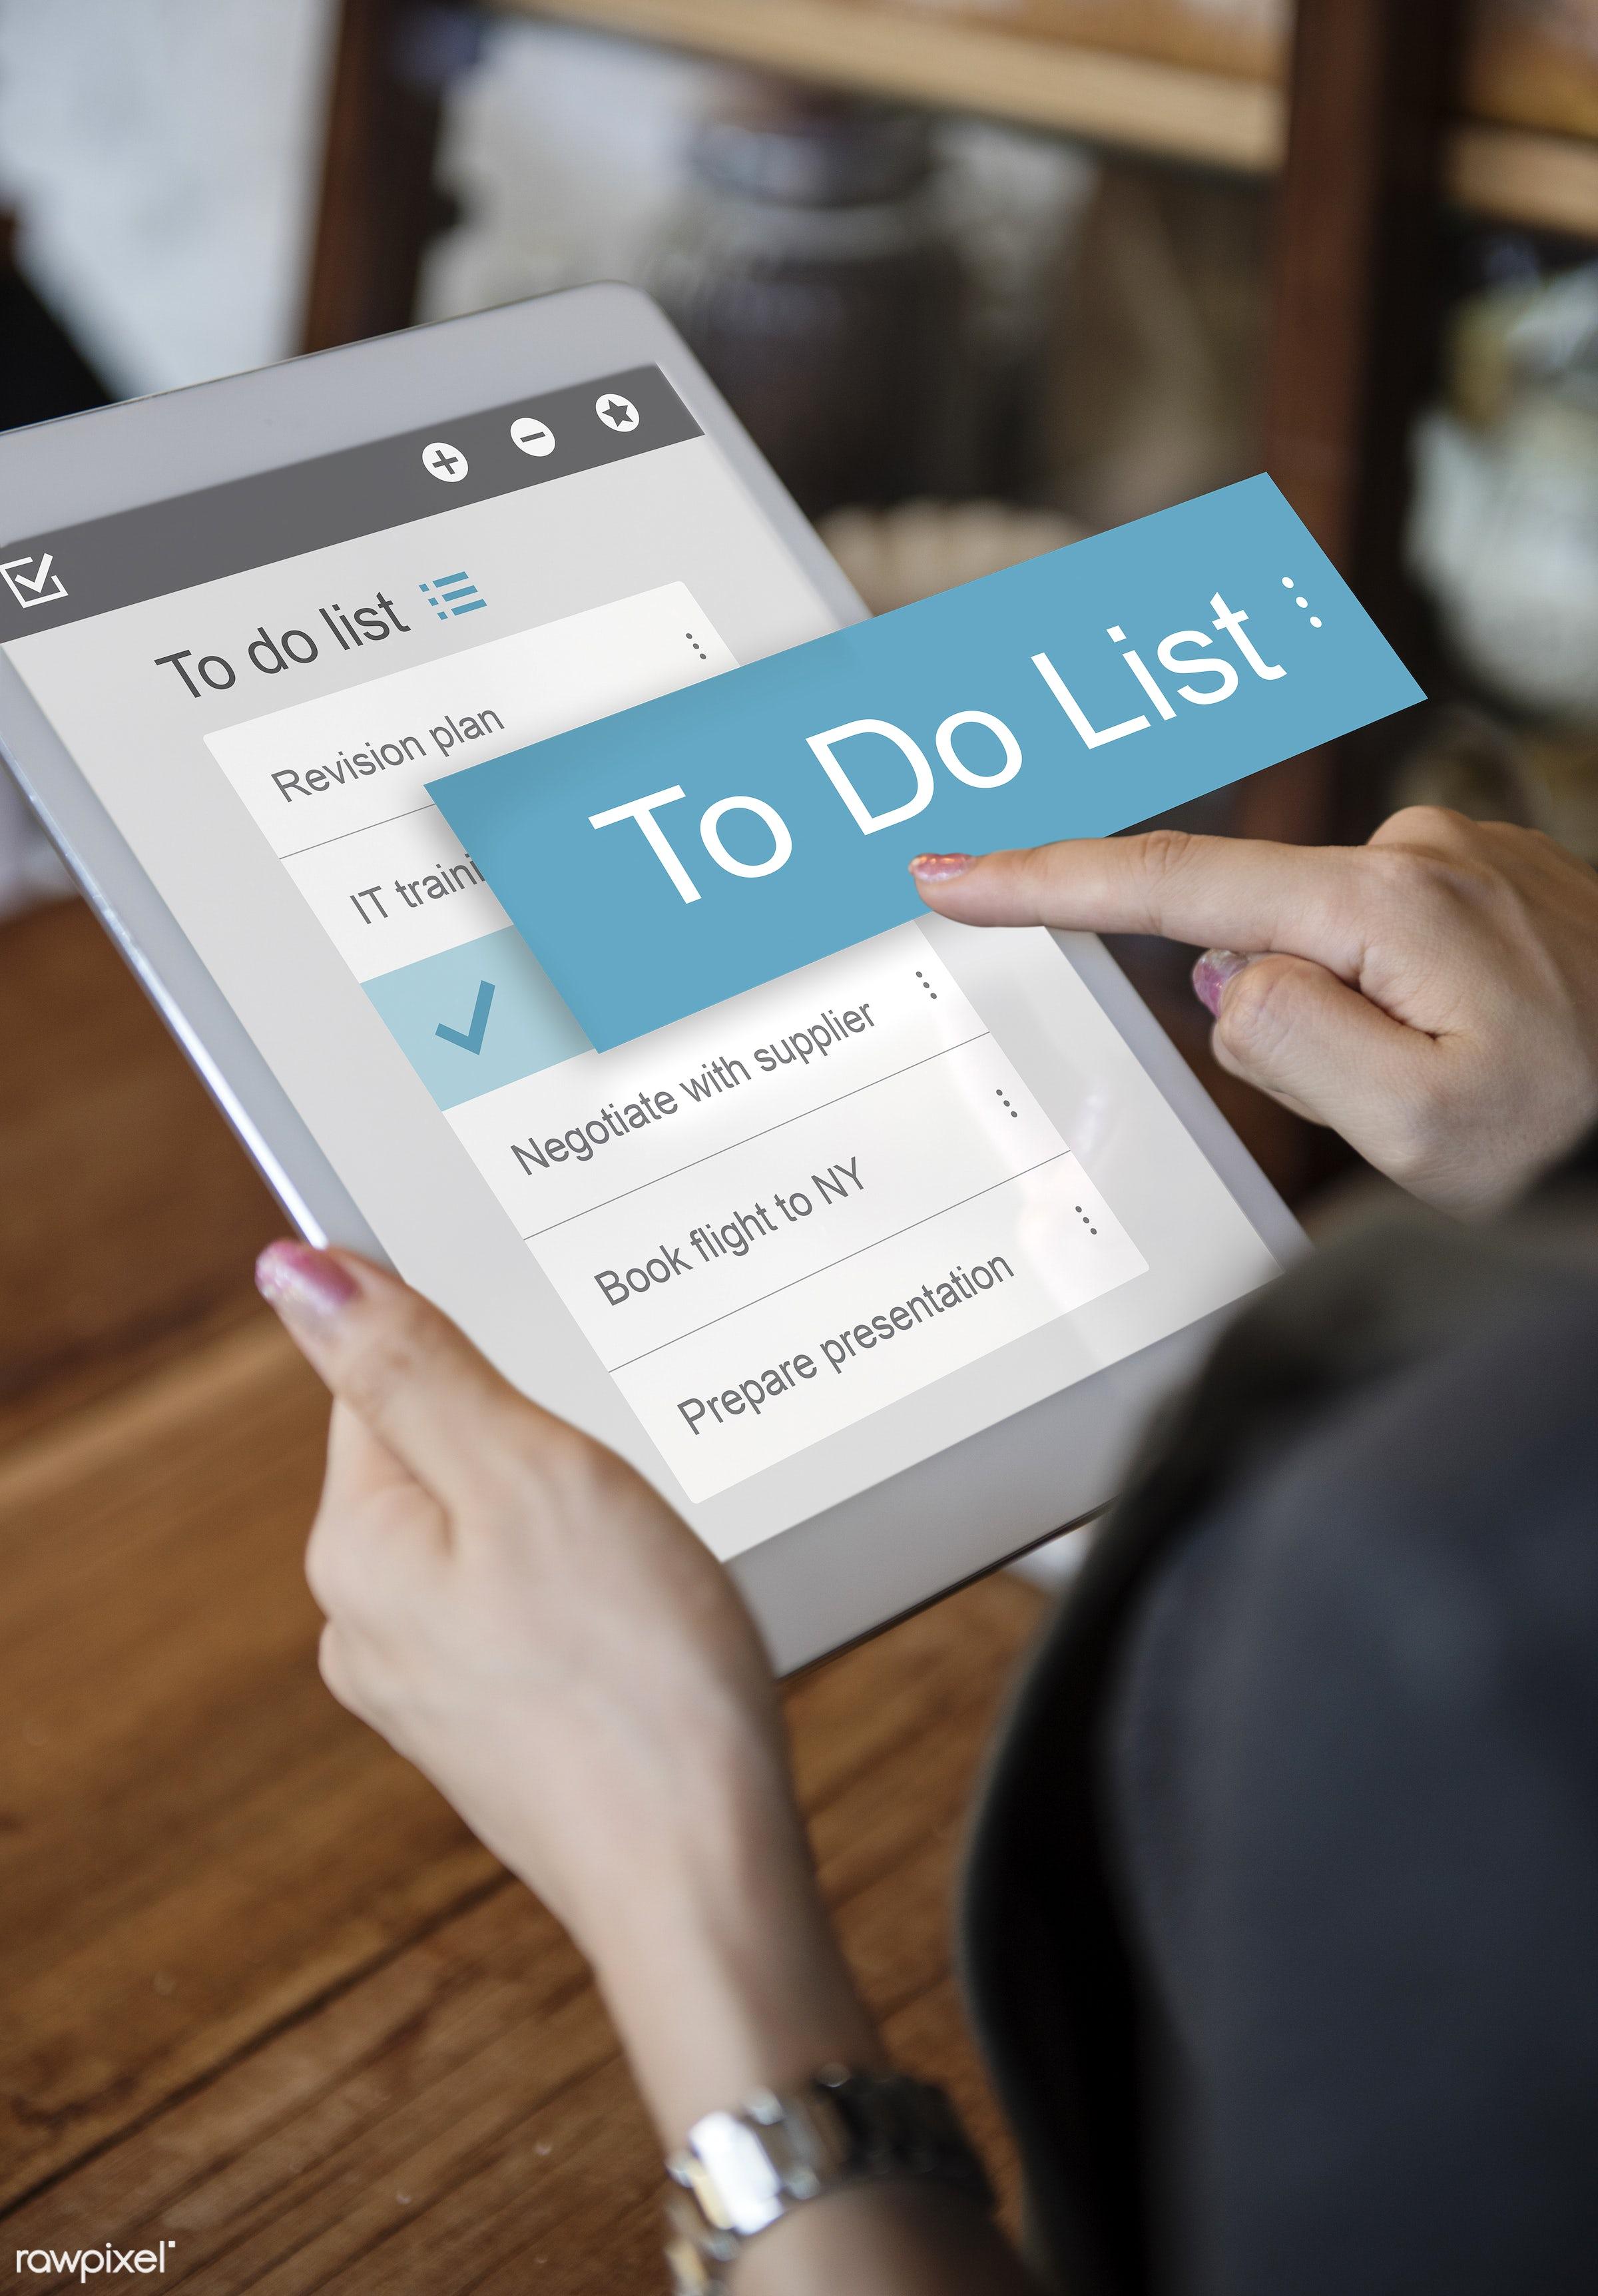 schedule, internet, list, agenda, app, appointment, business, calendar, candid, checklist, choose, communication, connection...